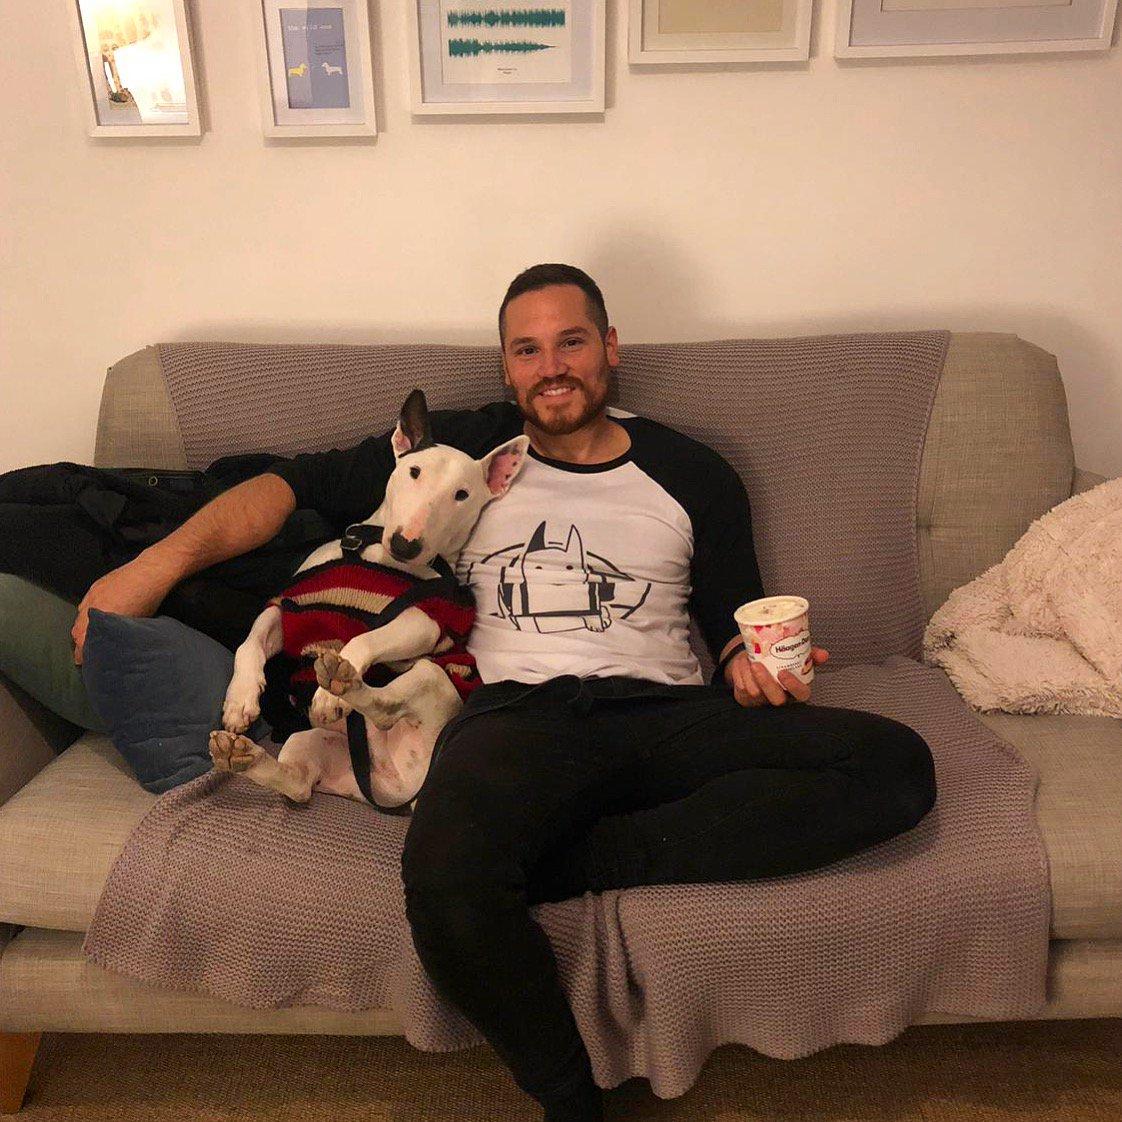 We chill harder than you party . . . . #doglover #doggo #dog #puppy #bullterrier #dogtravel #traveldog #dogsoftwitter #dogsofinstagram #dogmodel #puppers<br>http://pic.twitter.com/6D8rajMoKp